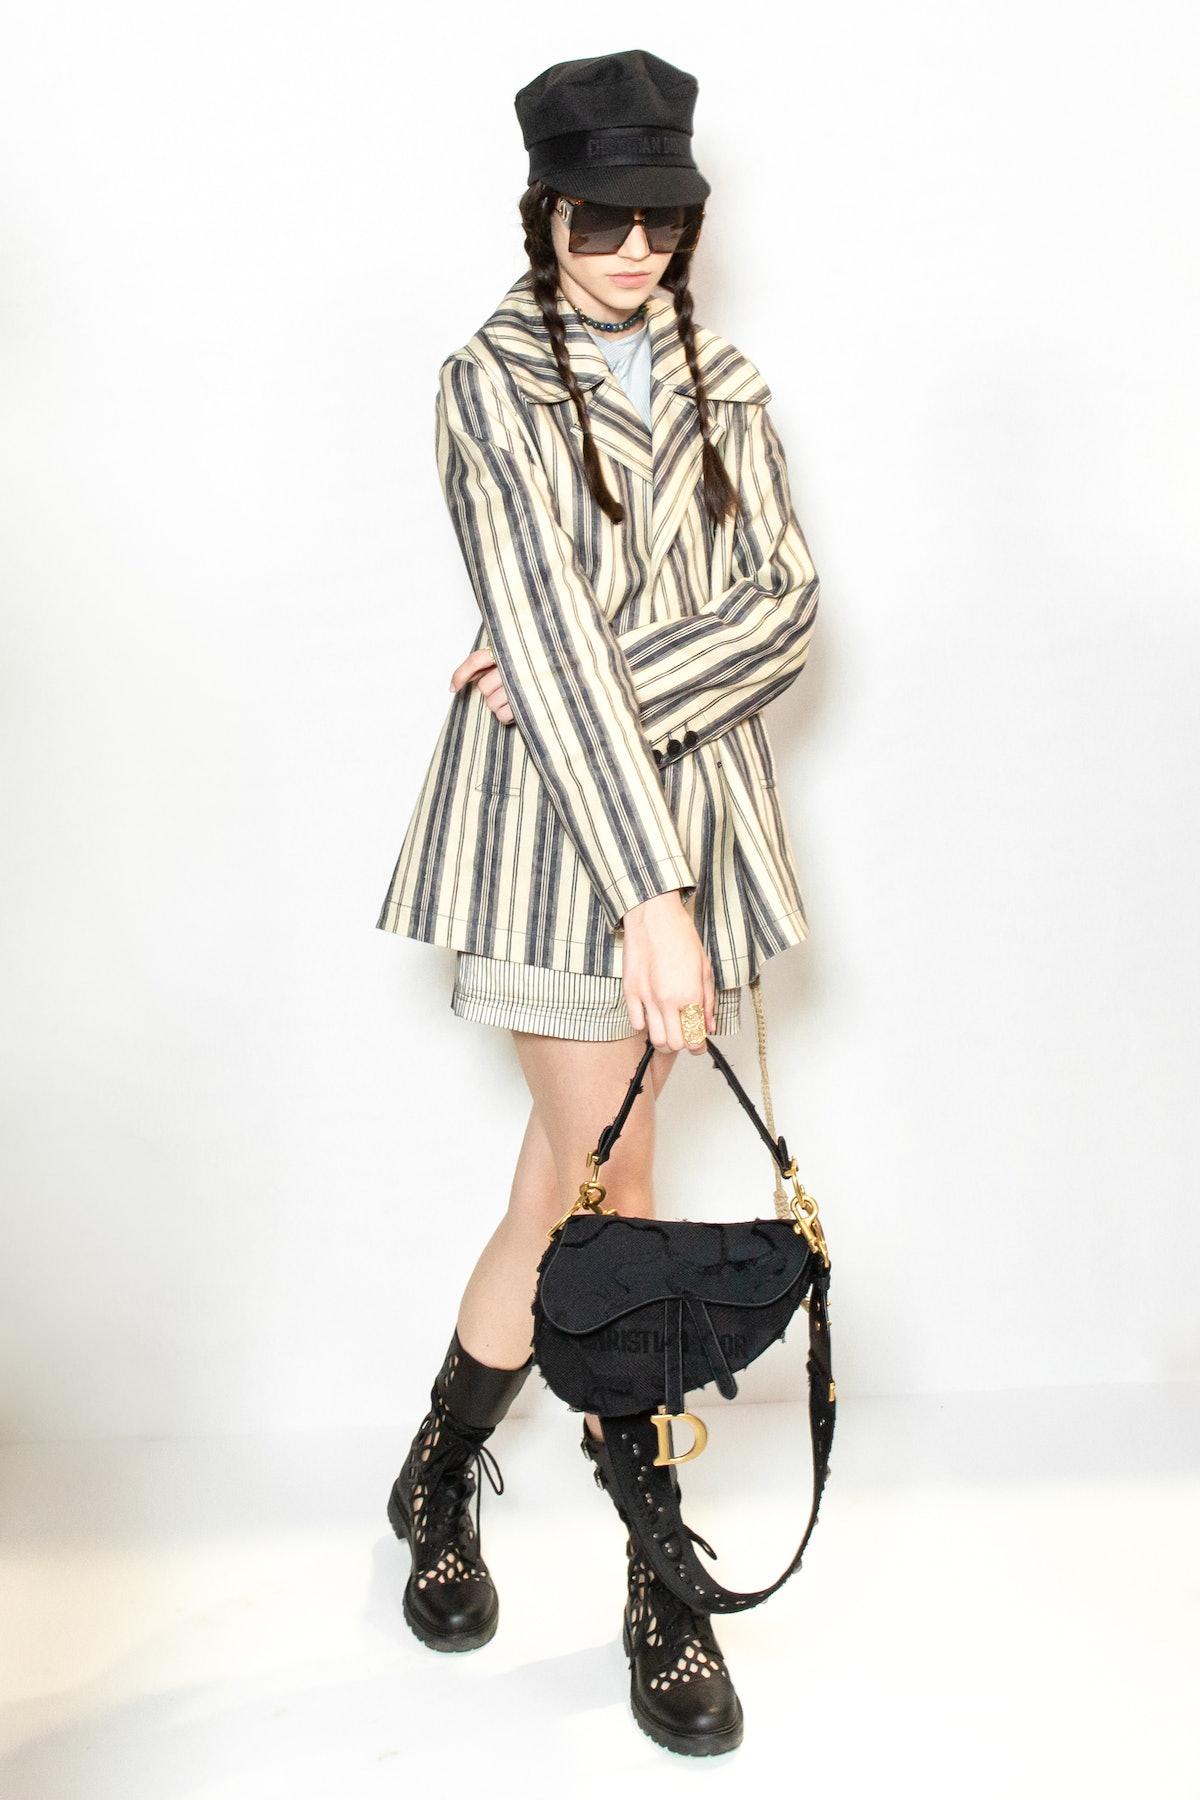 Serichai_Dior_BTS-086.jpg